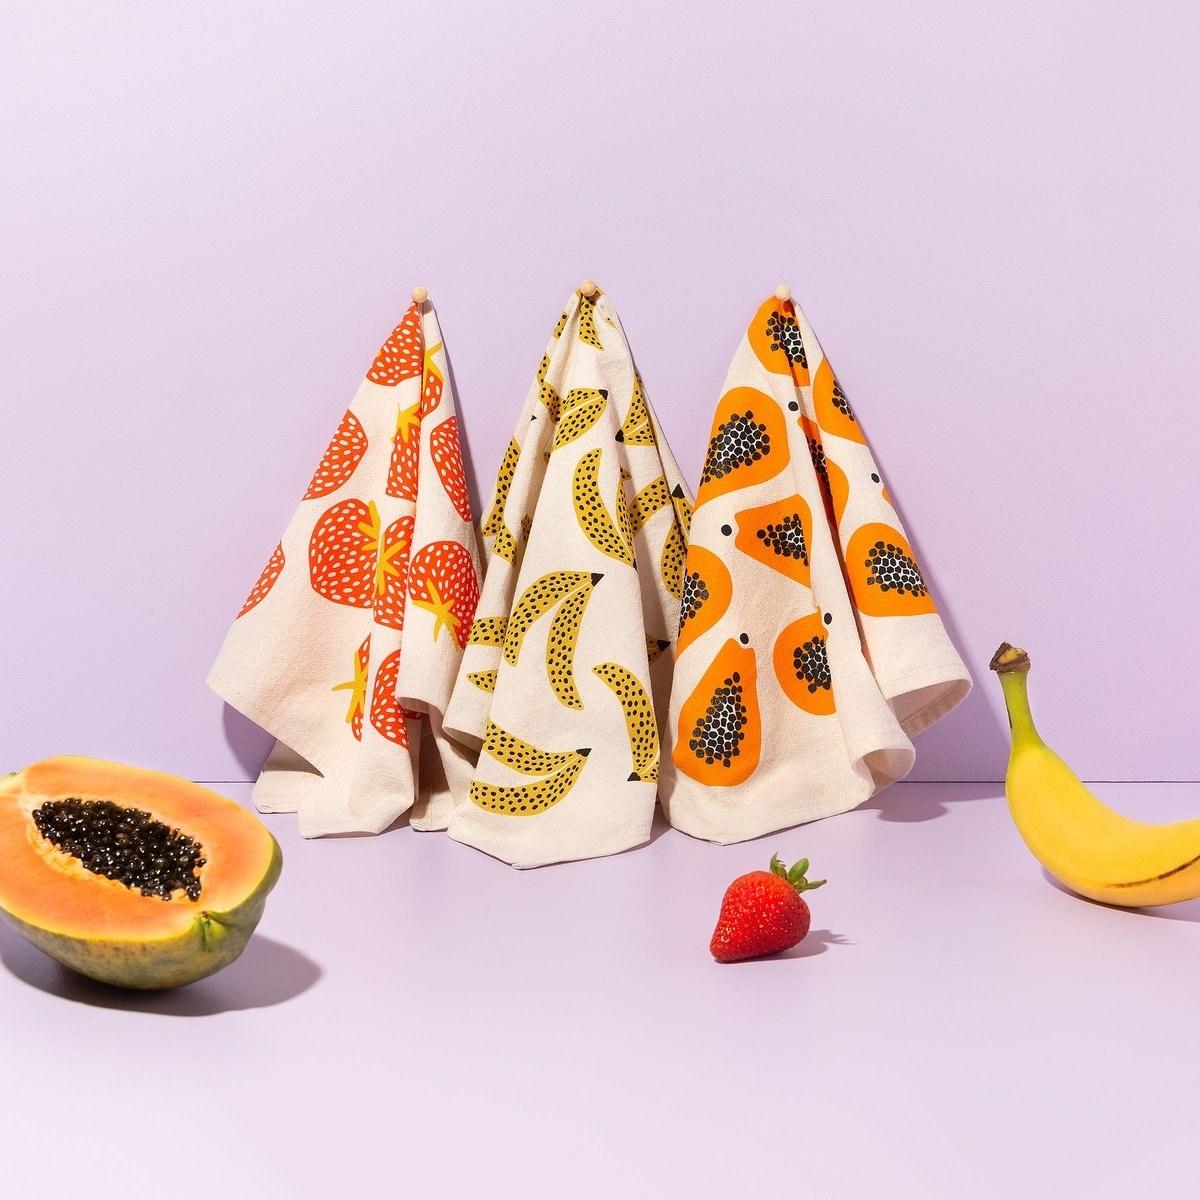 The tea towels in strawberry, banana, and papaya patterns